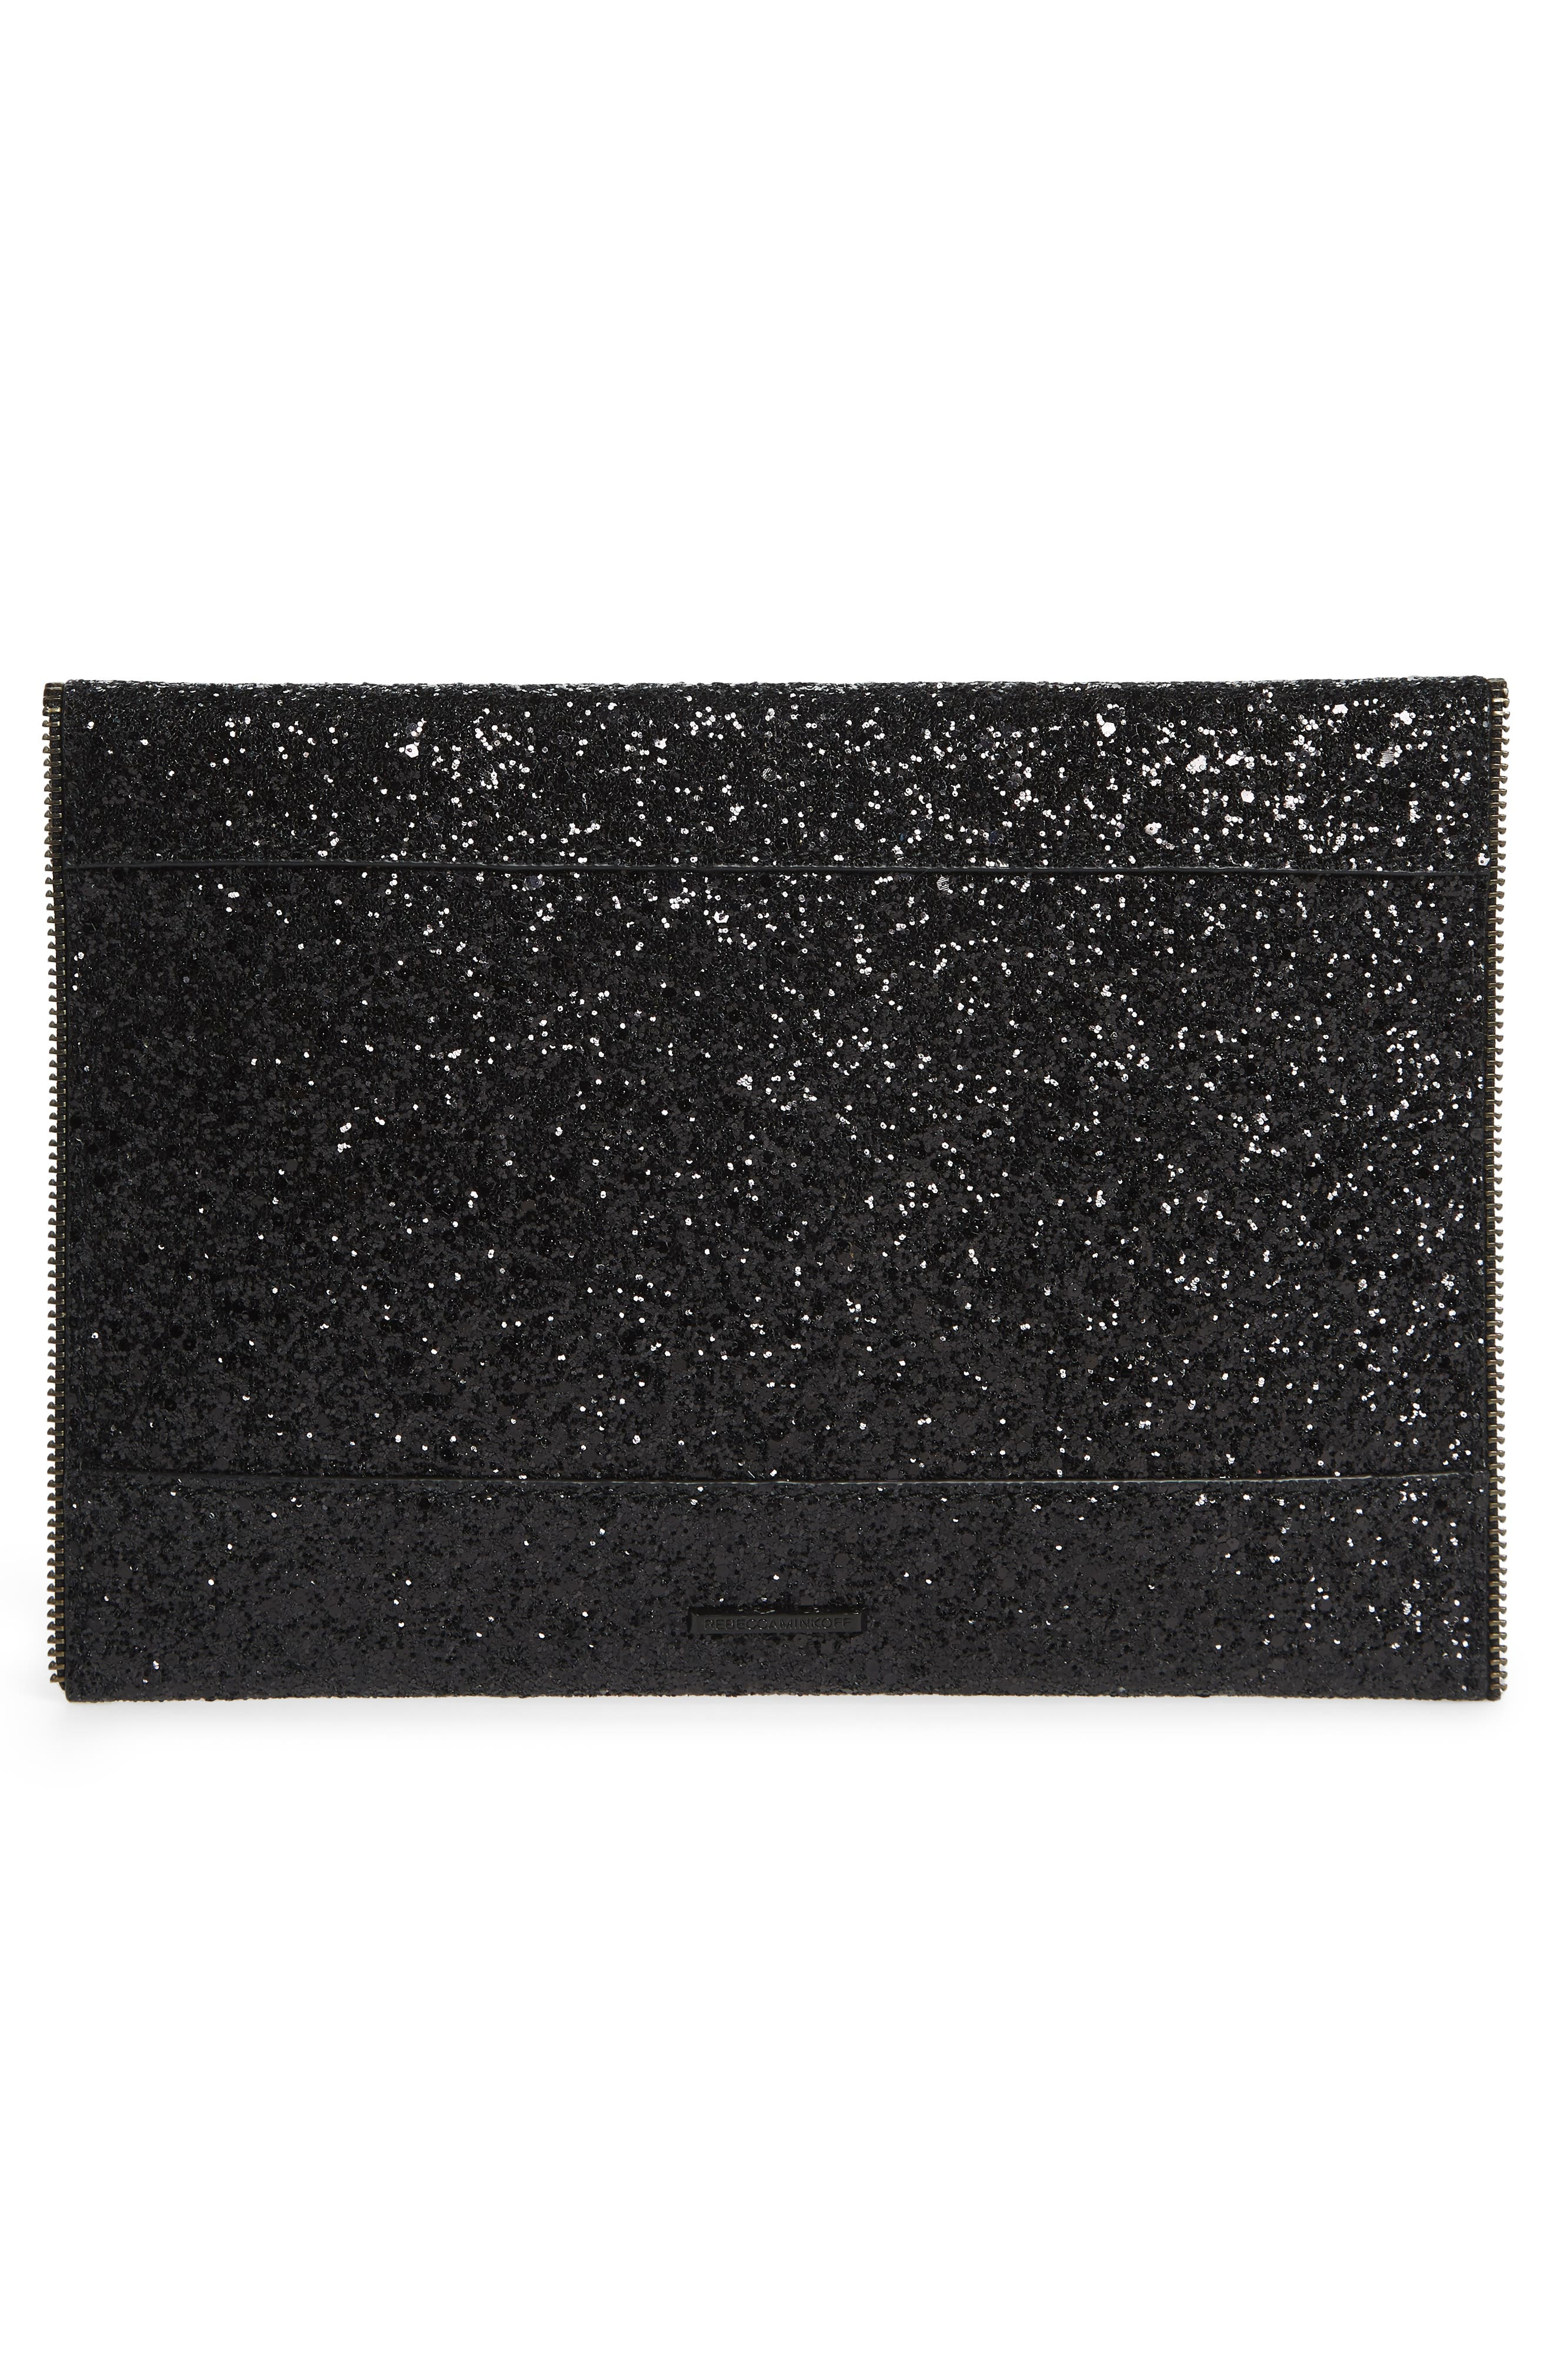 Leo Glitter Clutch,                             Alternate thumbnail 4, color,                             BLACK MULTI/ BLACK HRDWR